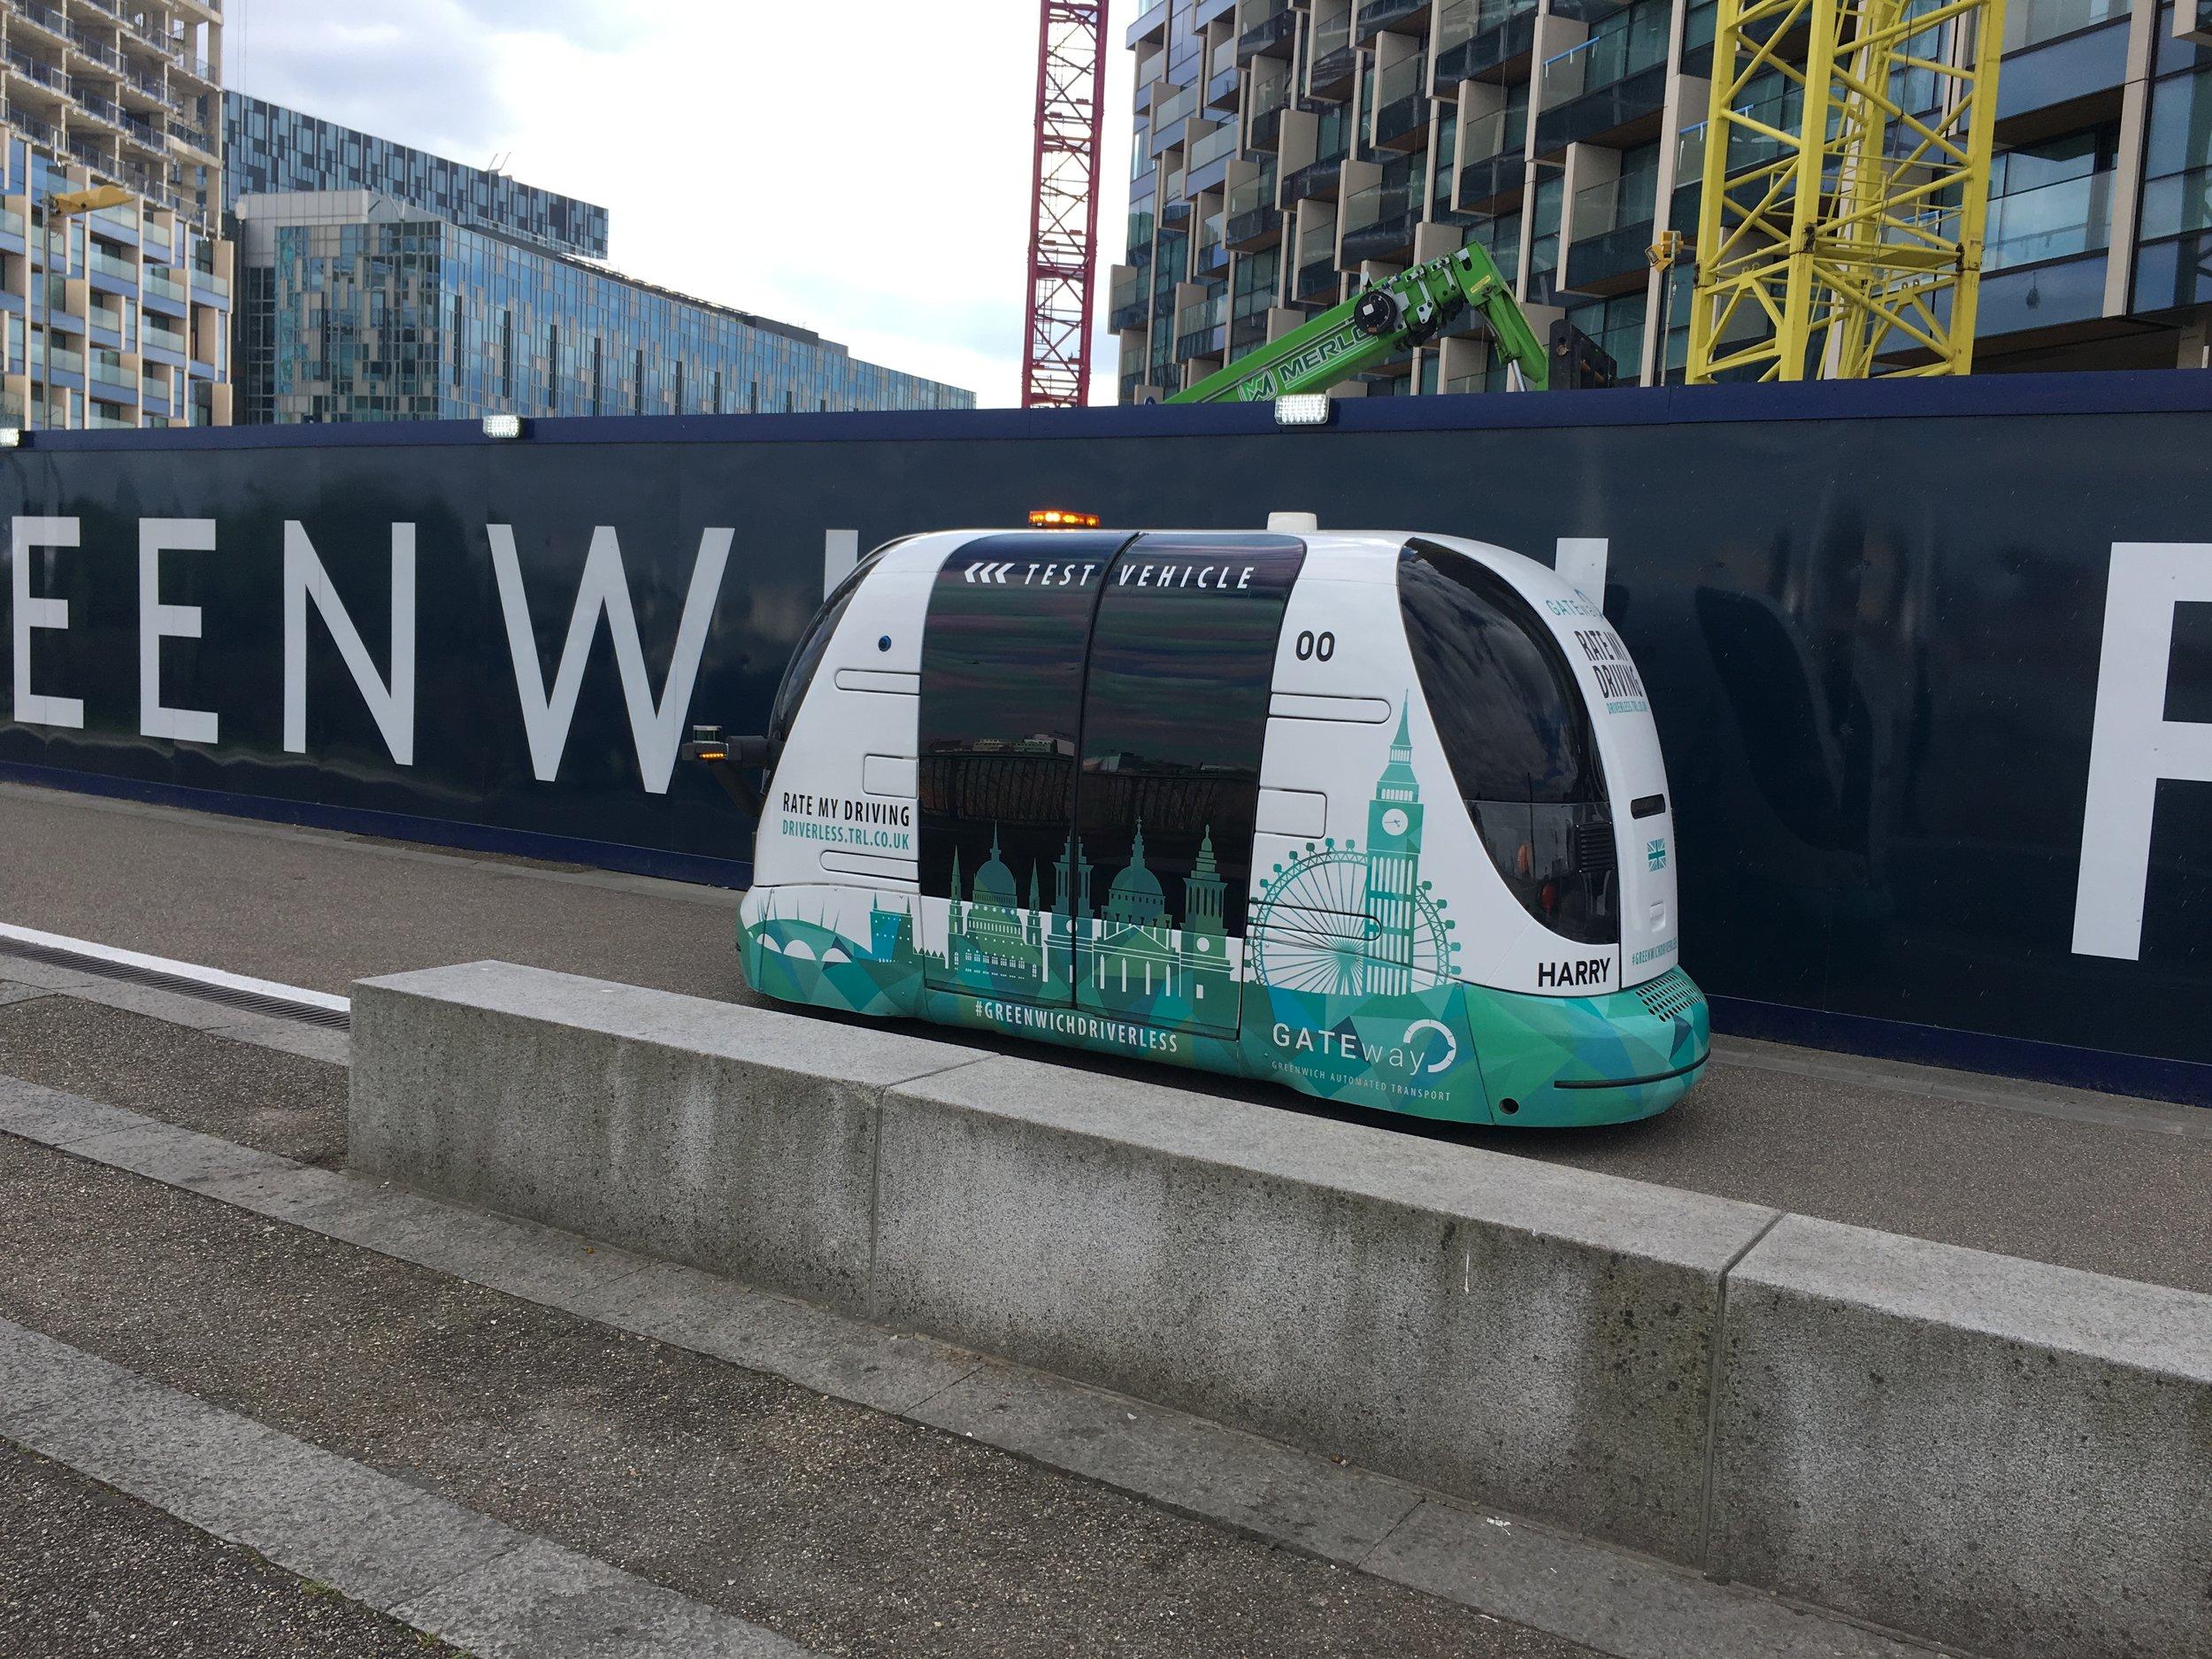 Greenwich London self-driving test vehicle (Photo credit: David Jones)